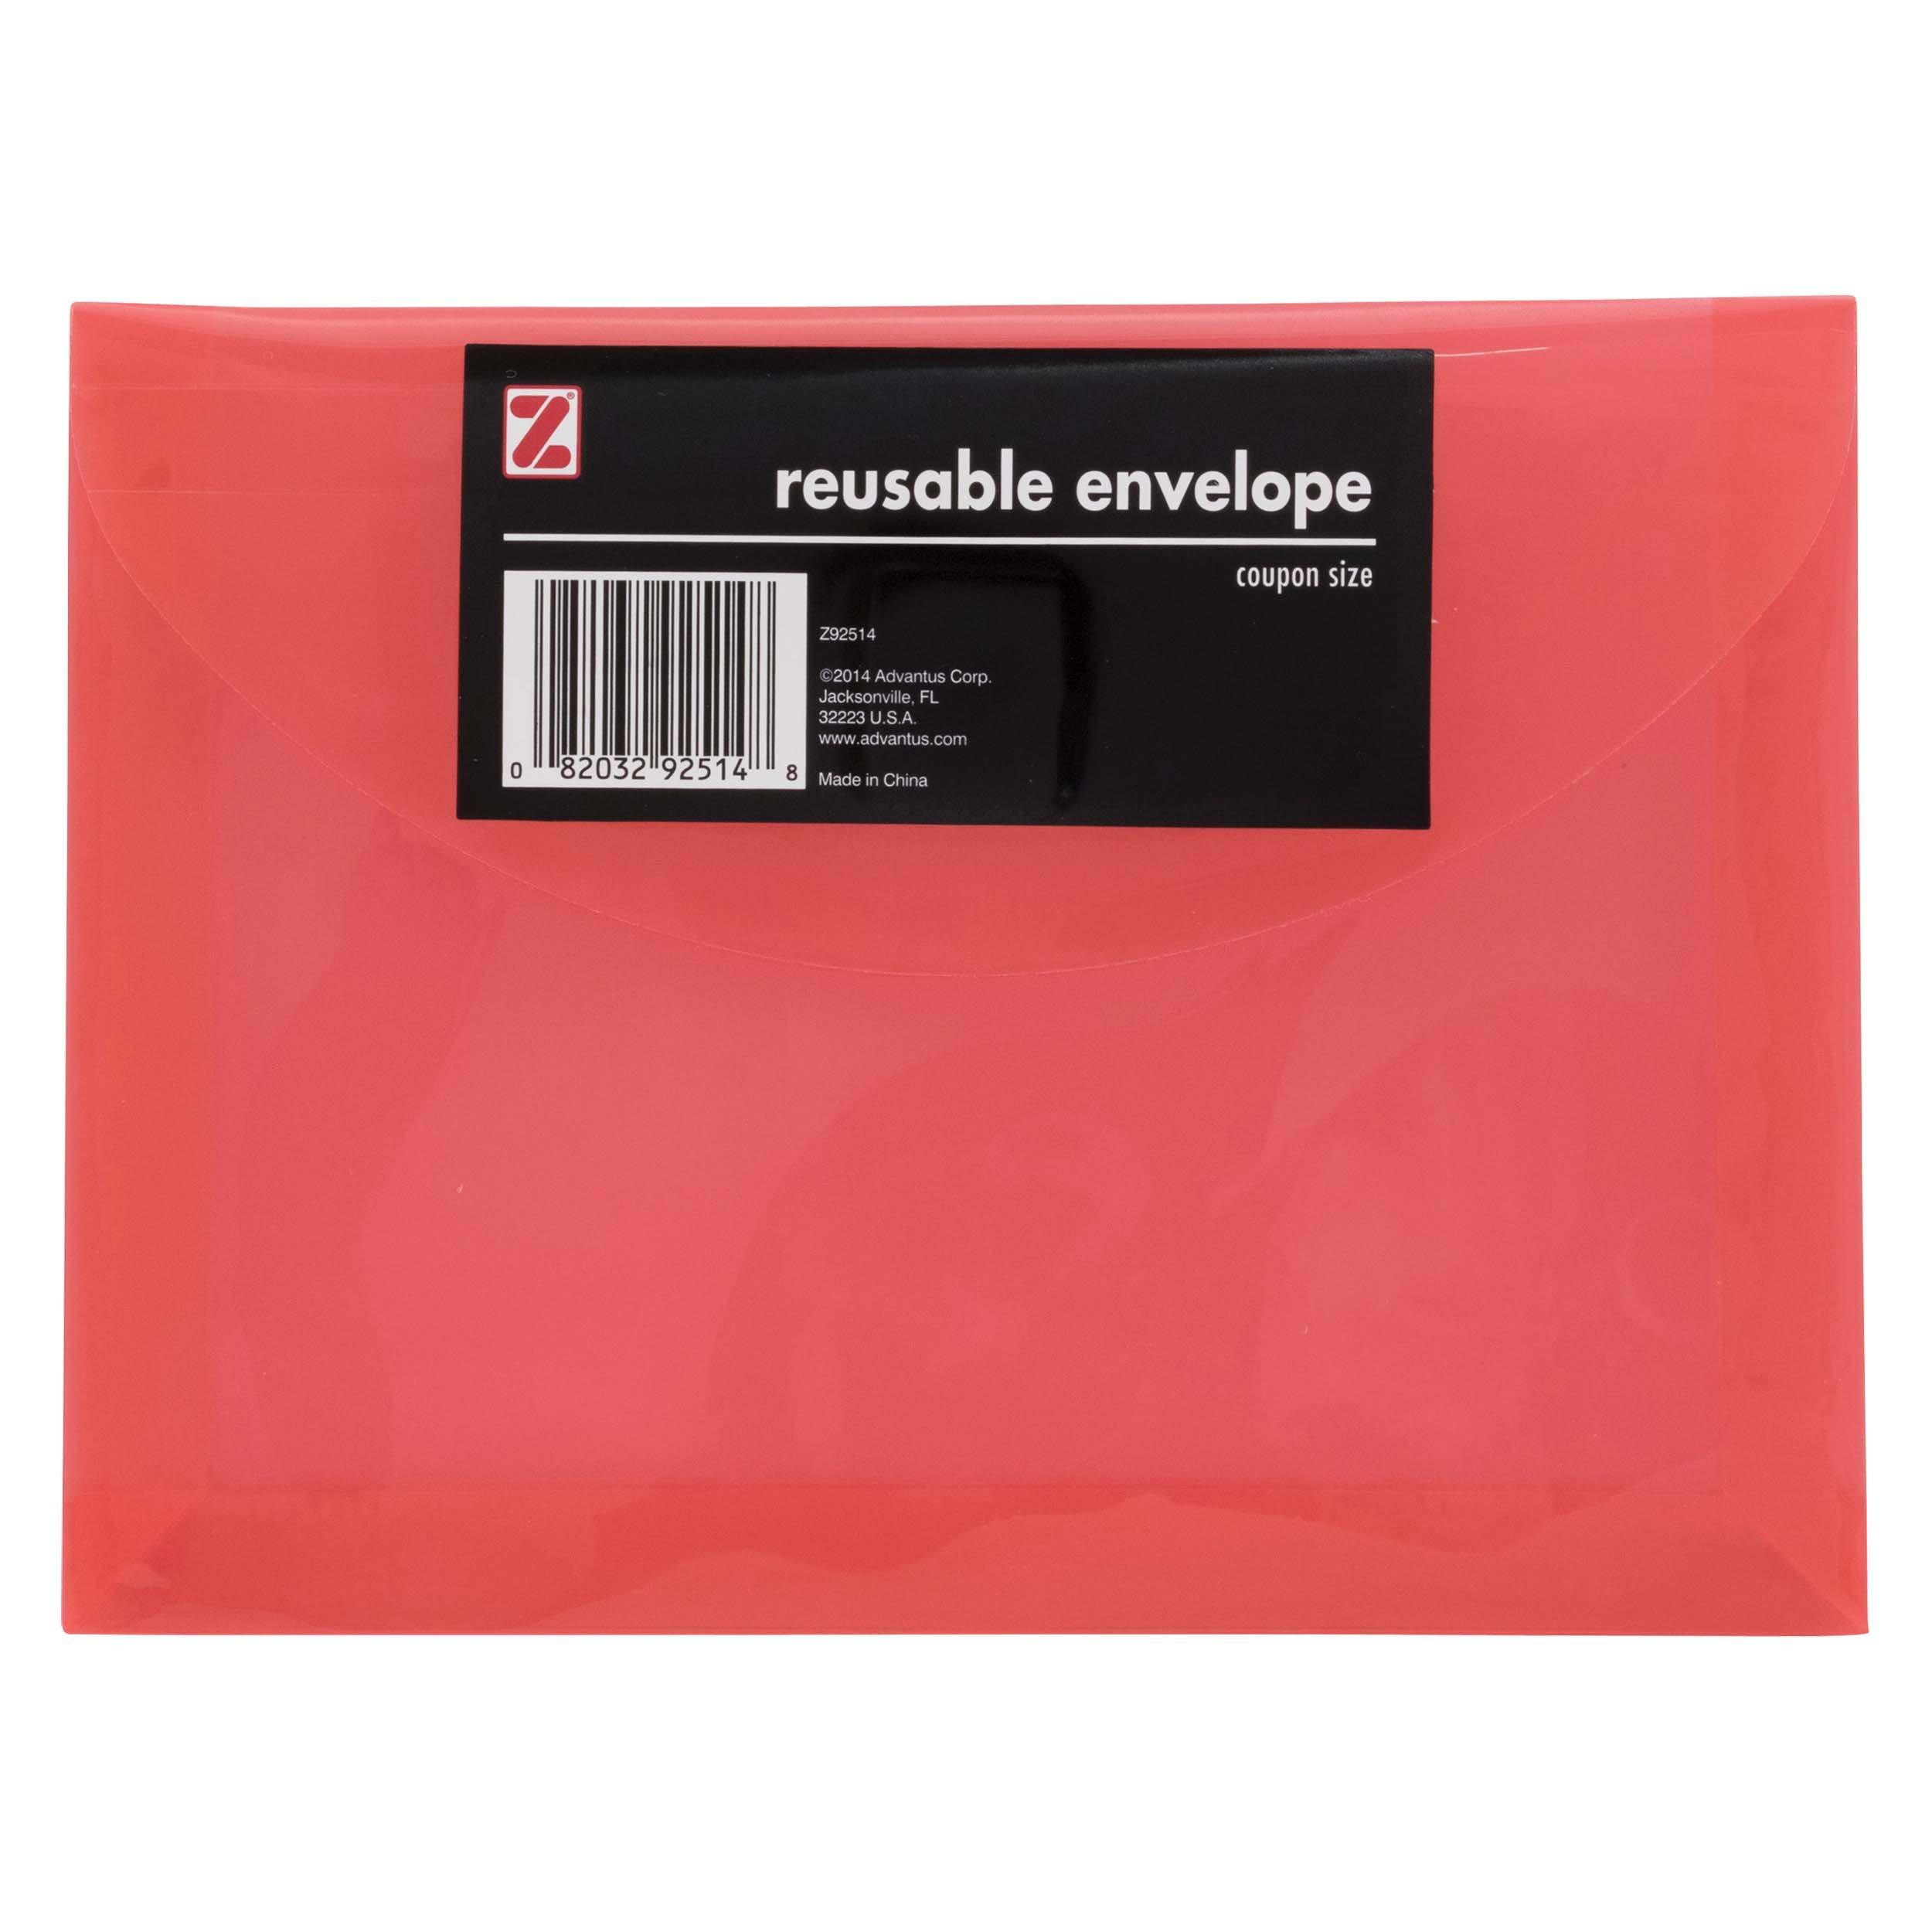 Z International Coupon Size Reusable Envelope - Shop Envelopes ...